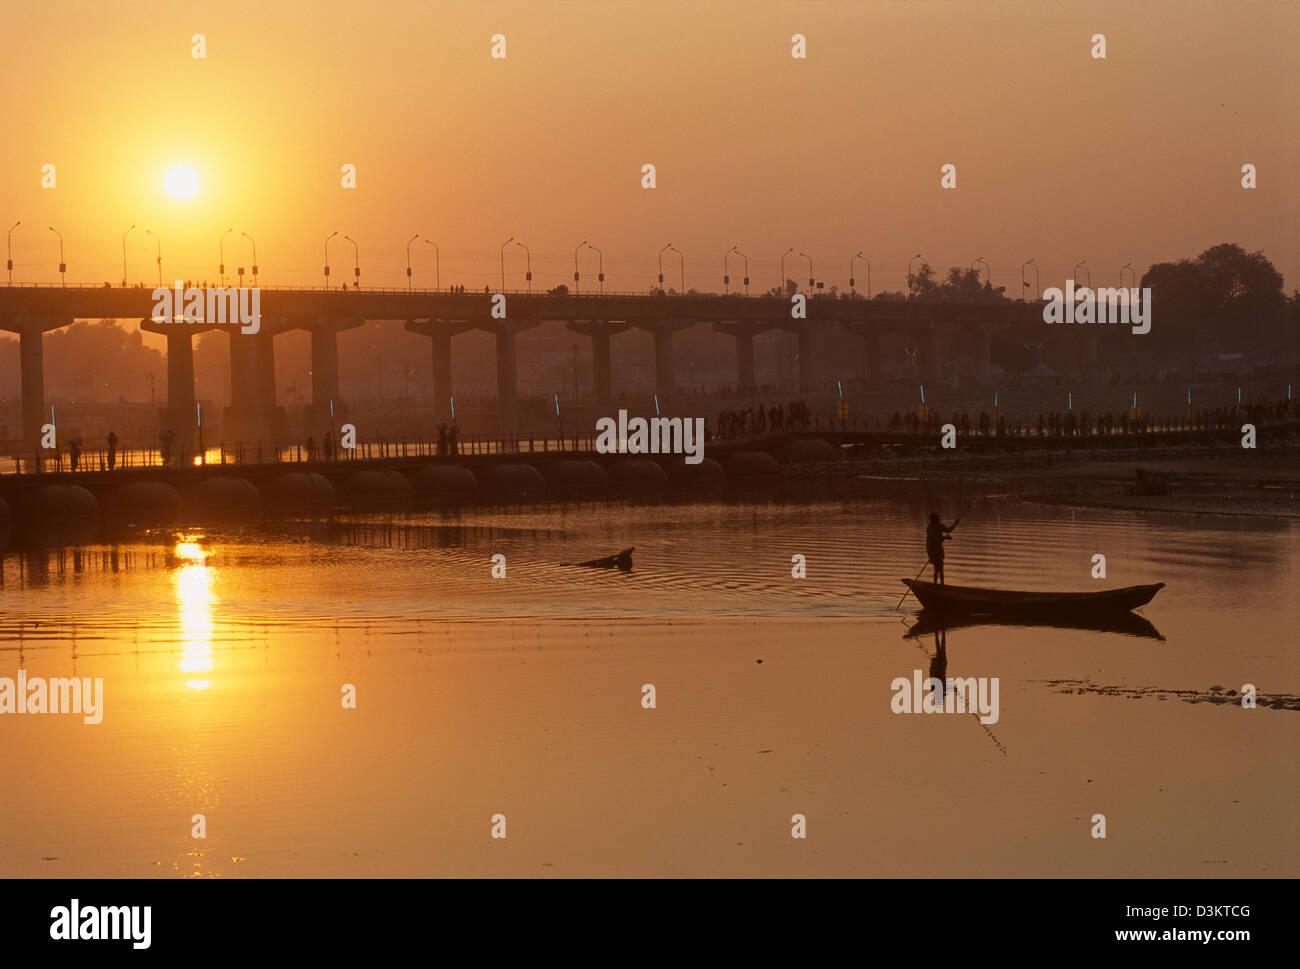 Barco siendo poled pasado el Grand Trunk Road Bridge al atardecer, Maha Kumbh Mela 2001, Allahabad, Uttar Pradesh, Foto de stock